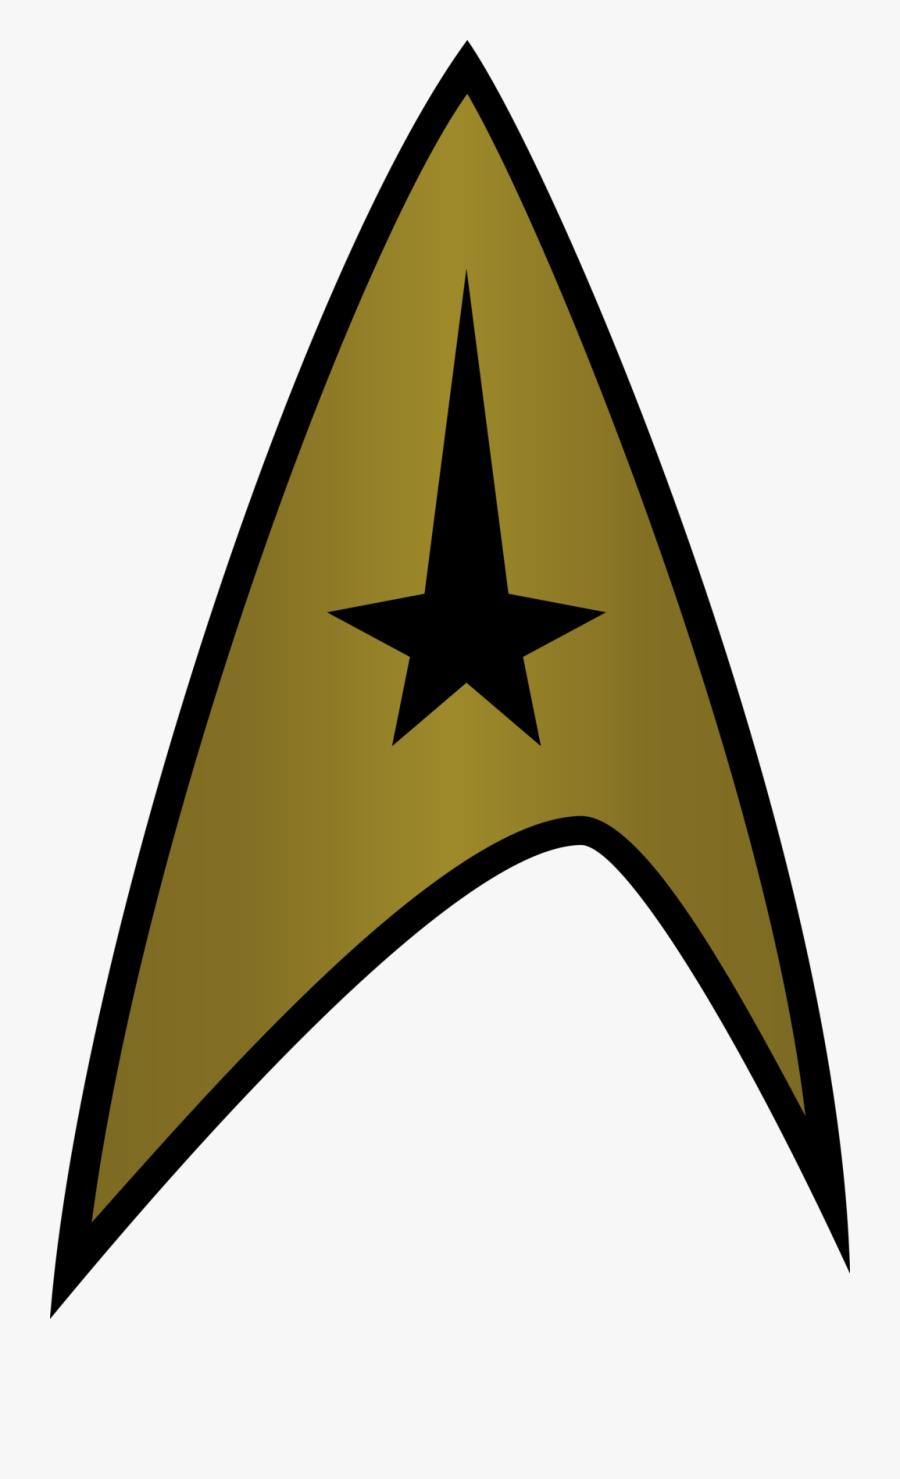 Star Trek Timelines Uhura Uss Enterprise Starship Enterprise - Star Trek Insignia Png, Transparent Clipart